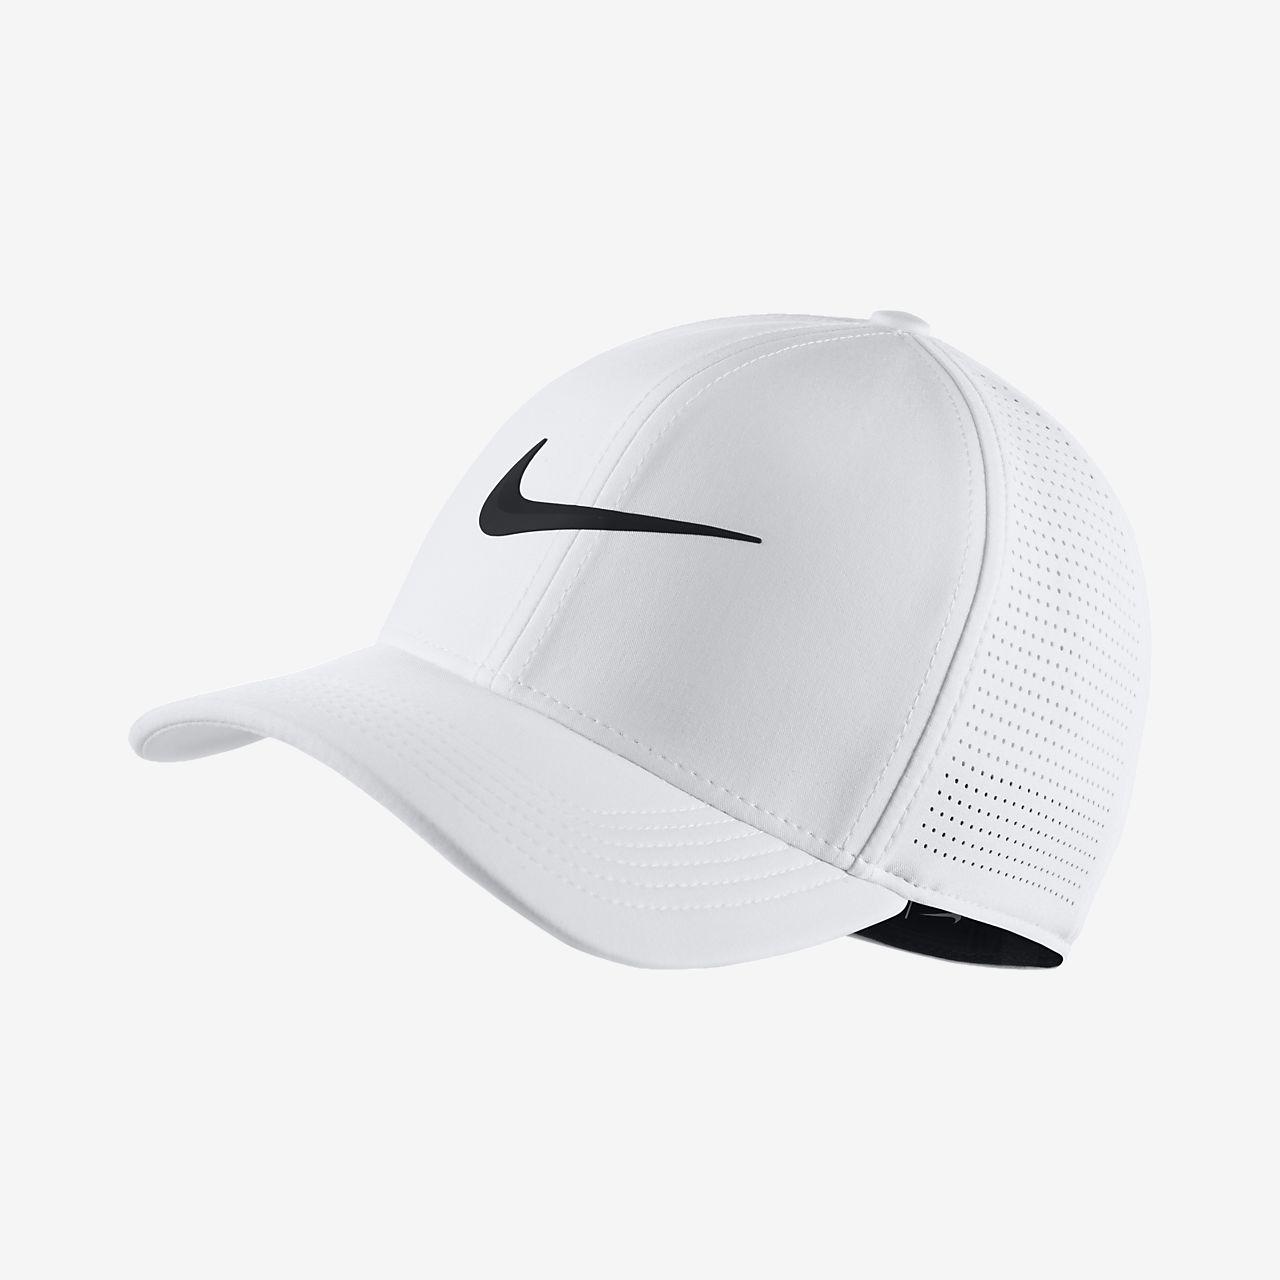 Casquette de golf ajustée Nike AeroBill Classic 99